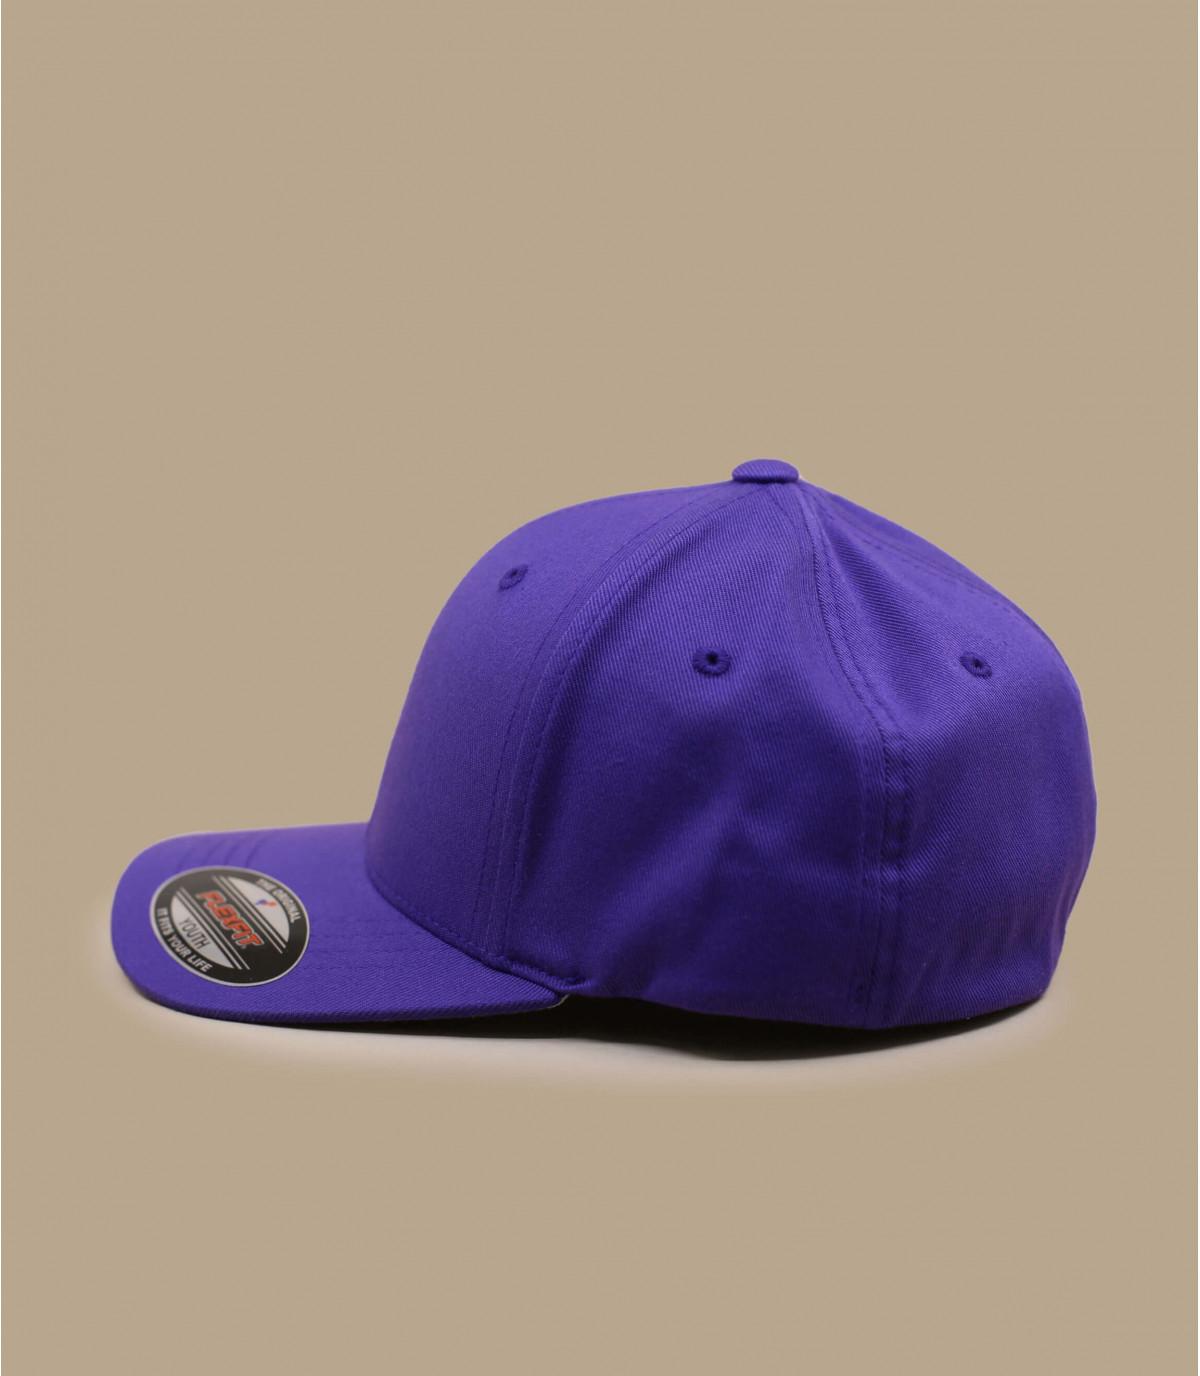 Gorra violetate flexfit kids